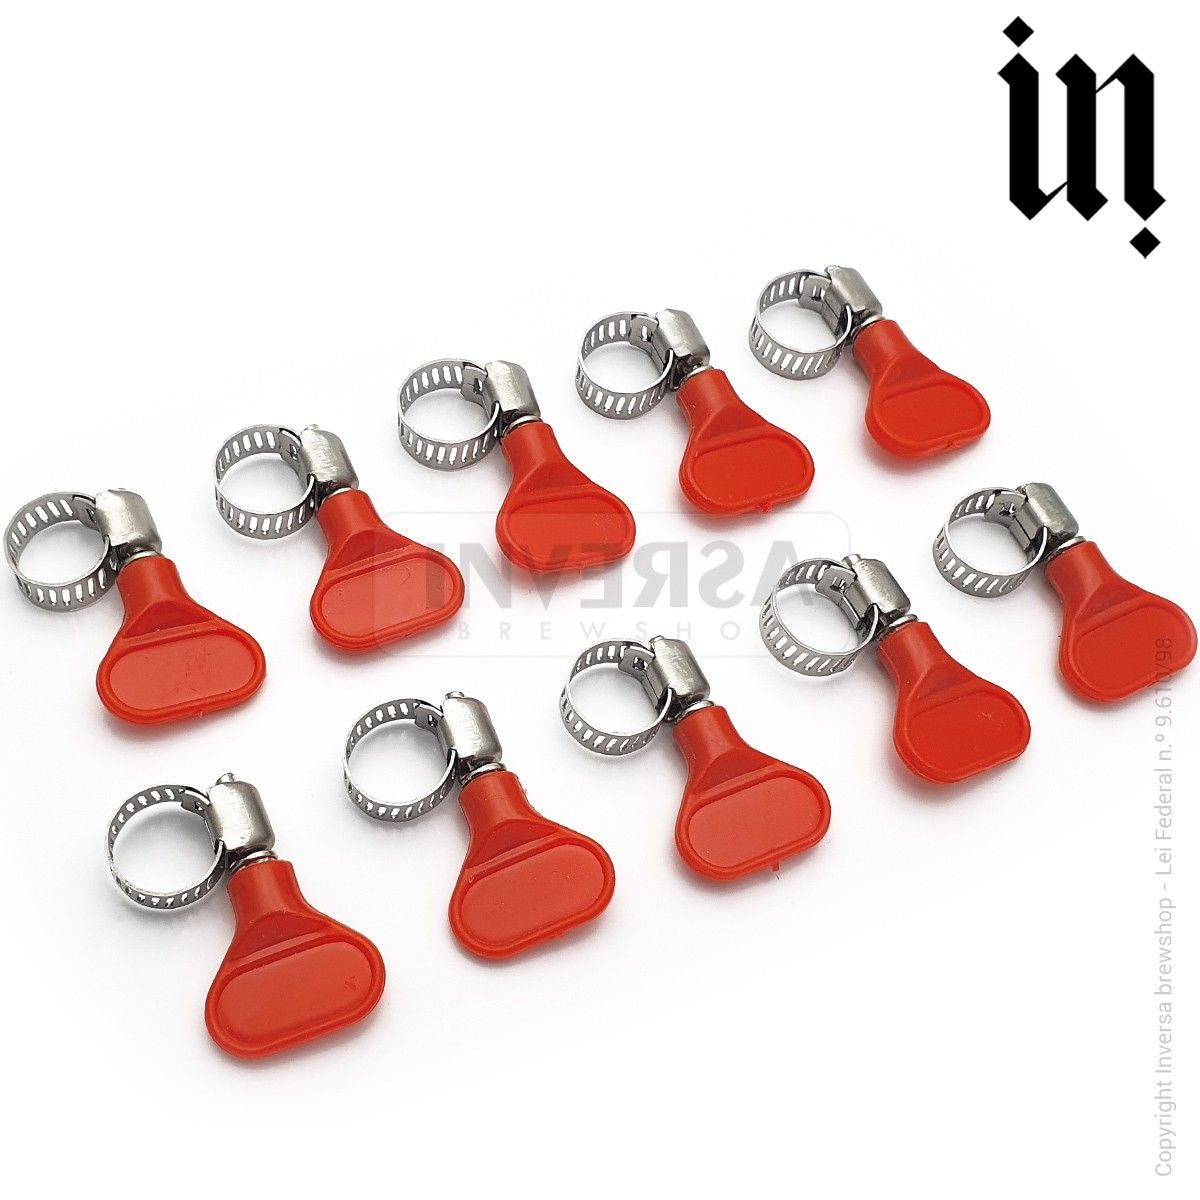 Abraçadeira Inox (8-12 Mm) Borboleta Plástica (10 und)